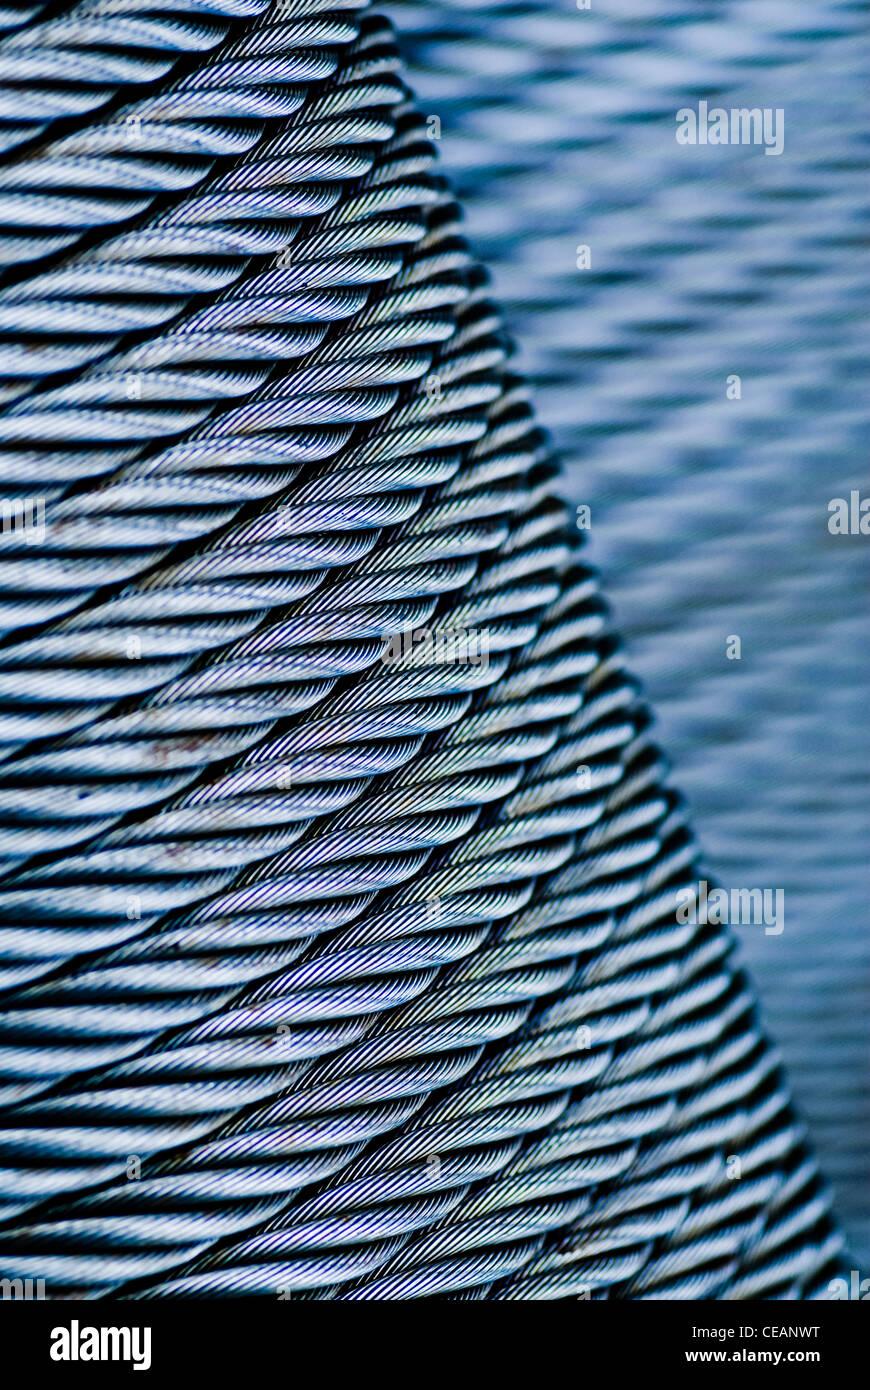 Cerca de alambre de acero Imagen De Stock